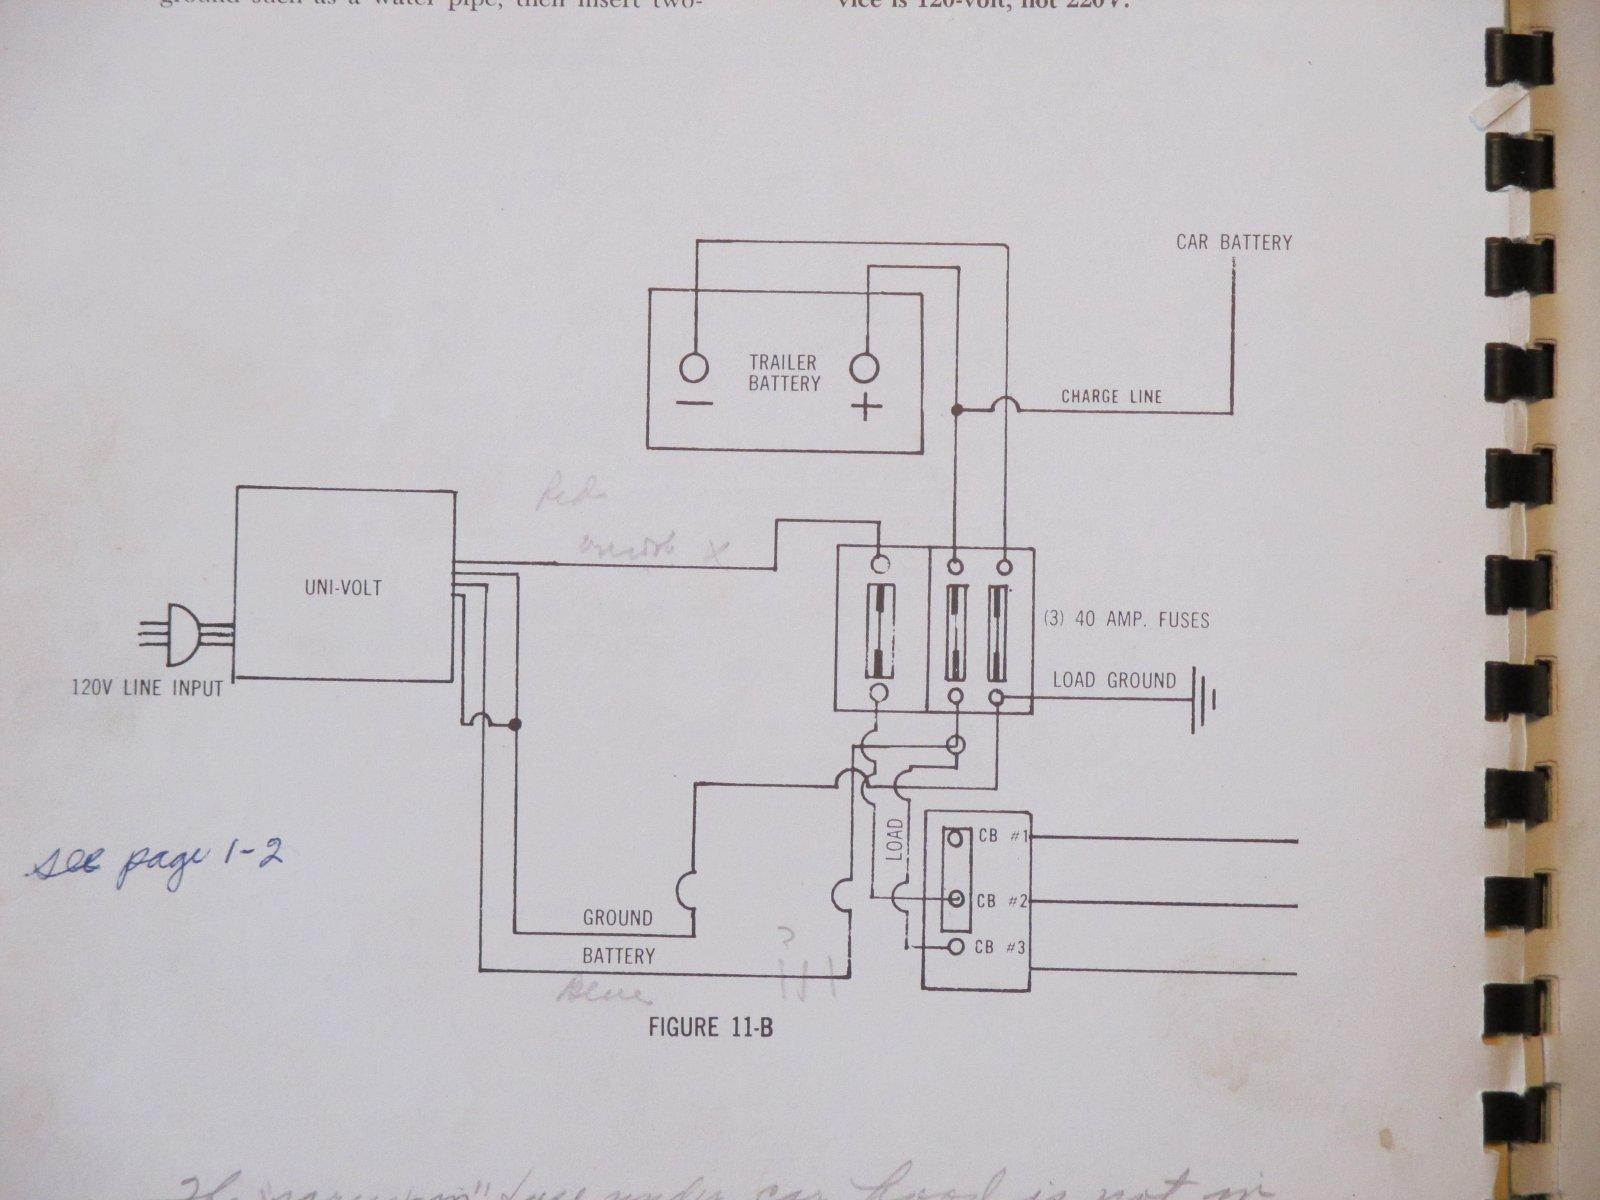 ... Click image for larger version Name: 1404 Univolt Wiring Diagram.jpg  Views: 286